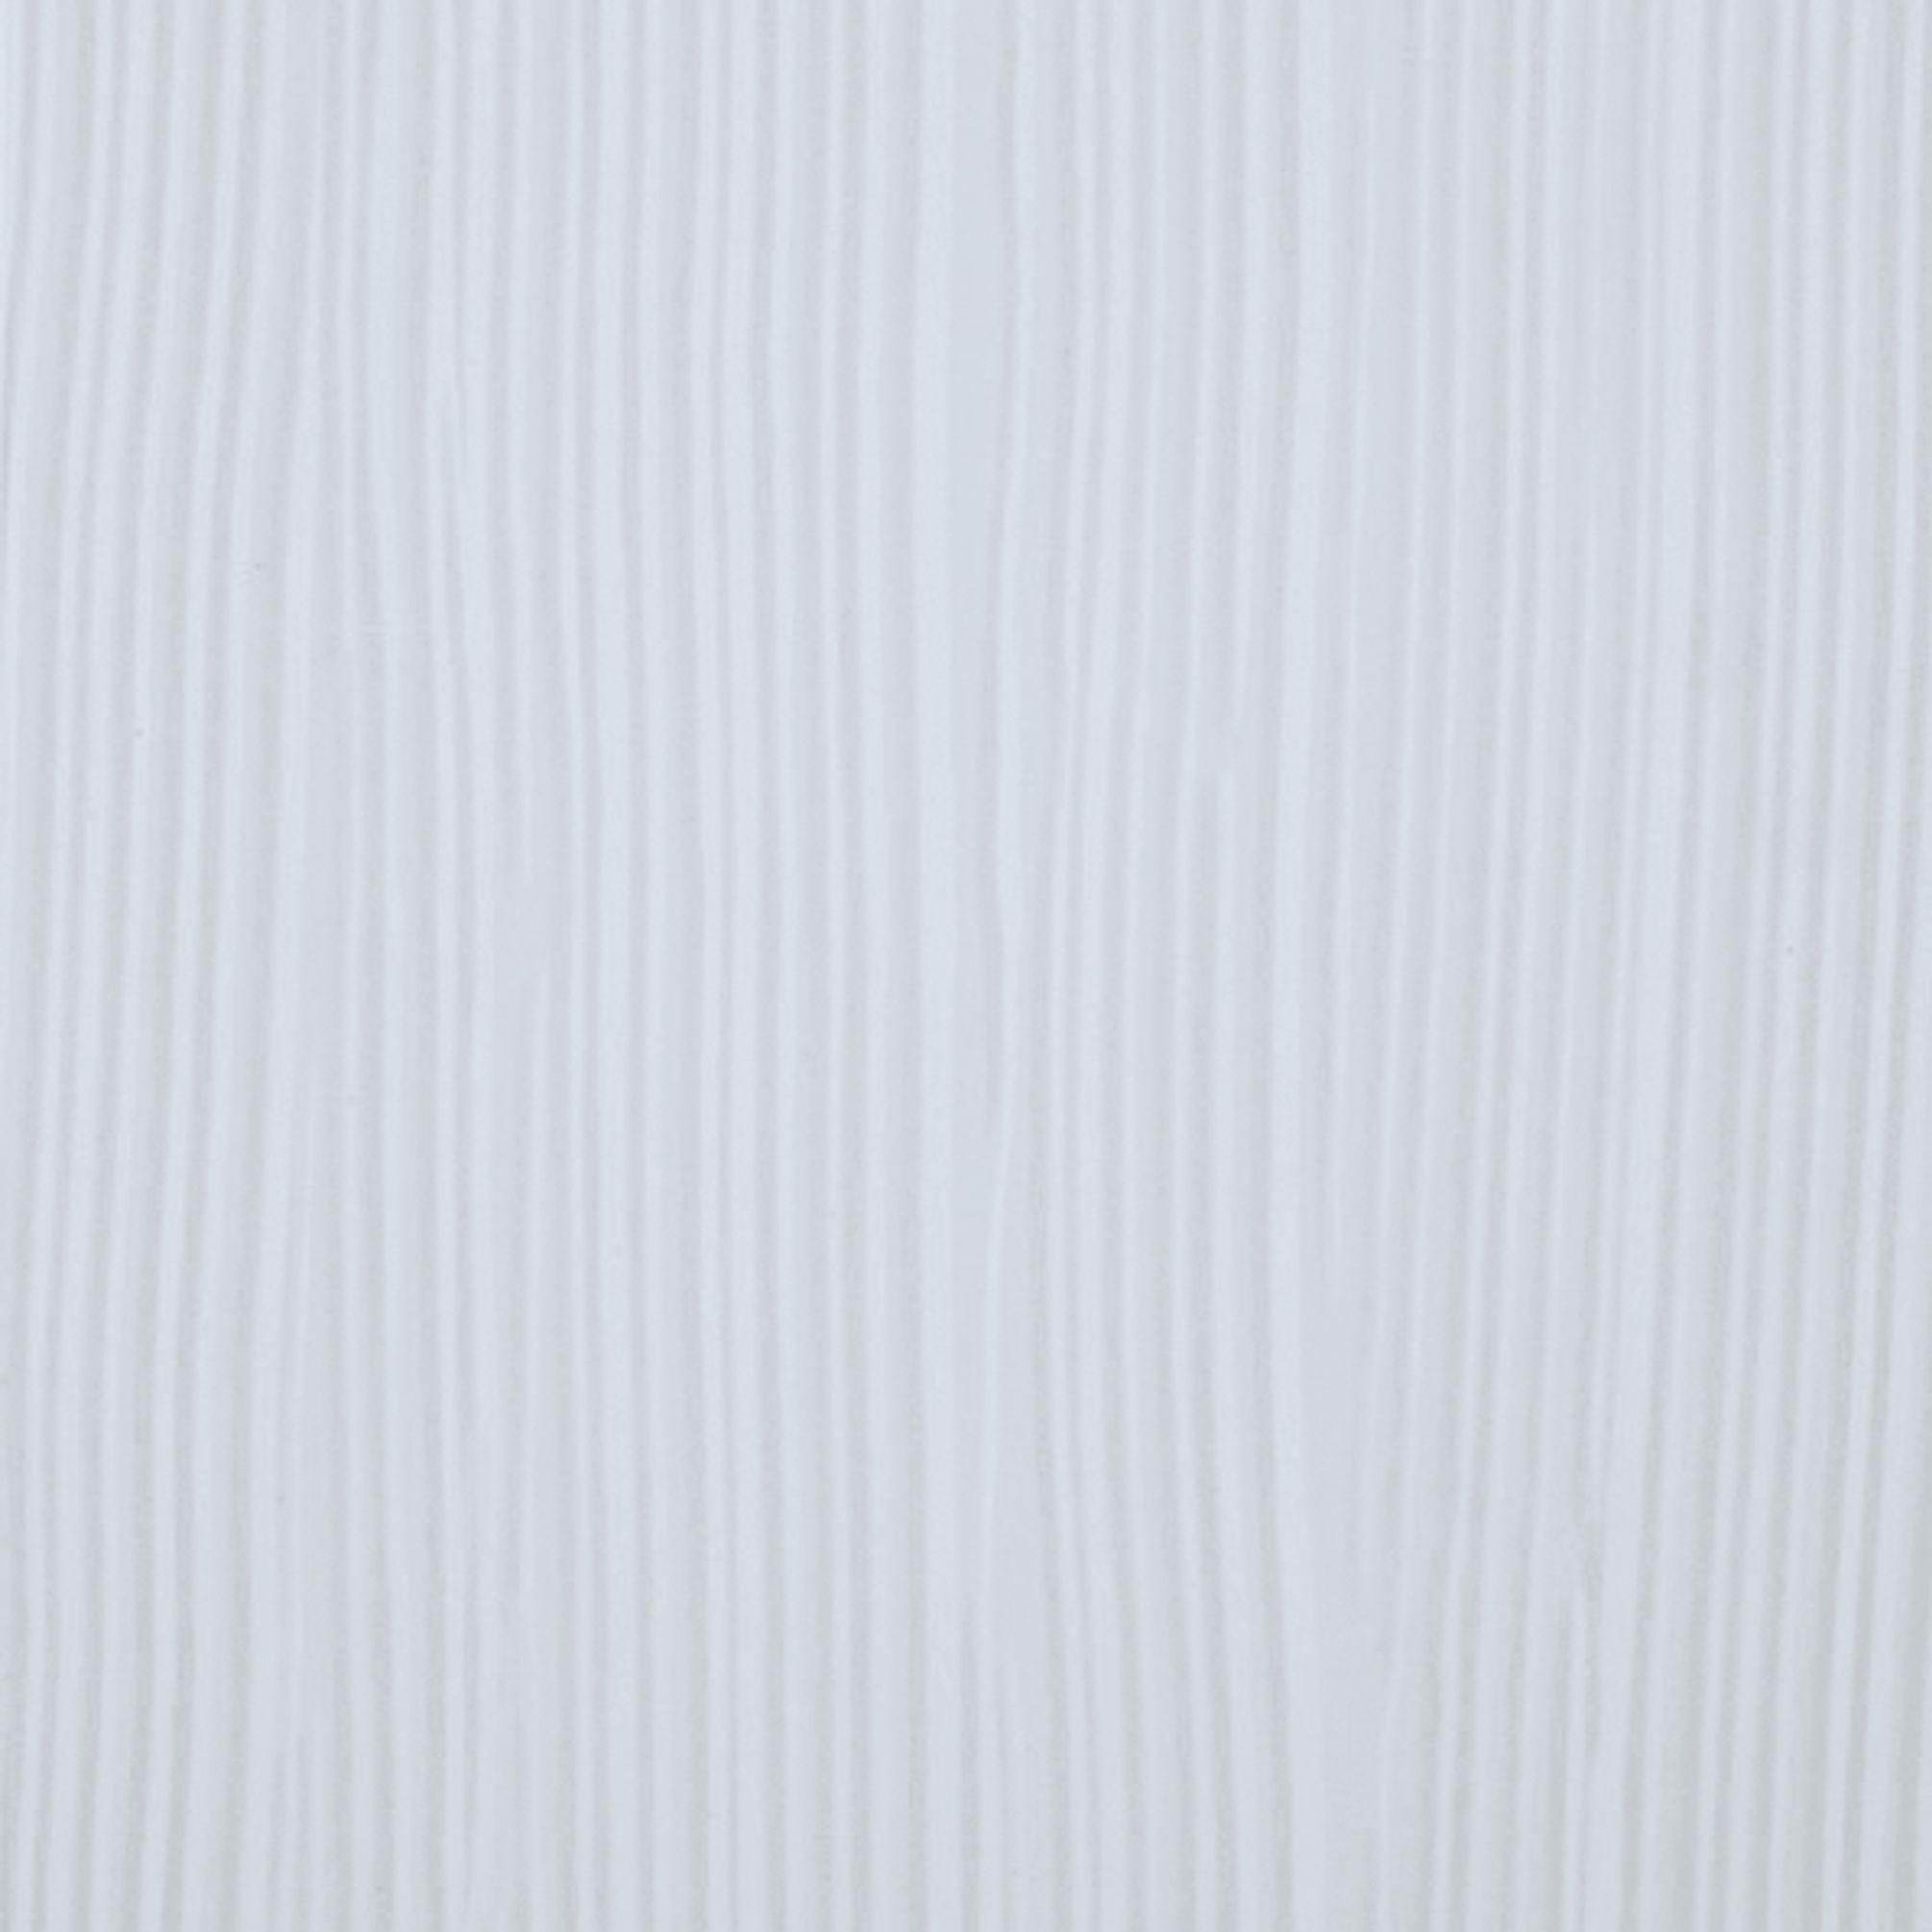 Bathroom ceiling cladding pvc panels - B Q White Cladding L 2400 Mm W 100 Mm T 10 Mm Pack Of 5 Departments Diy At B Q